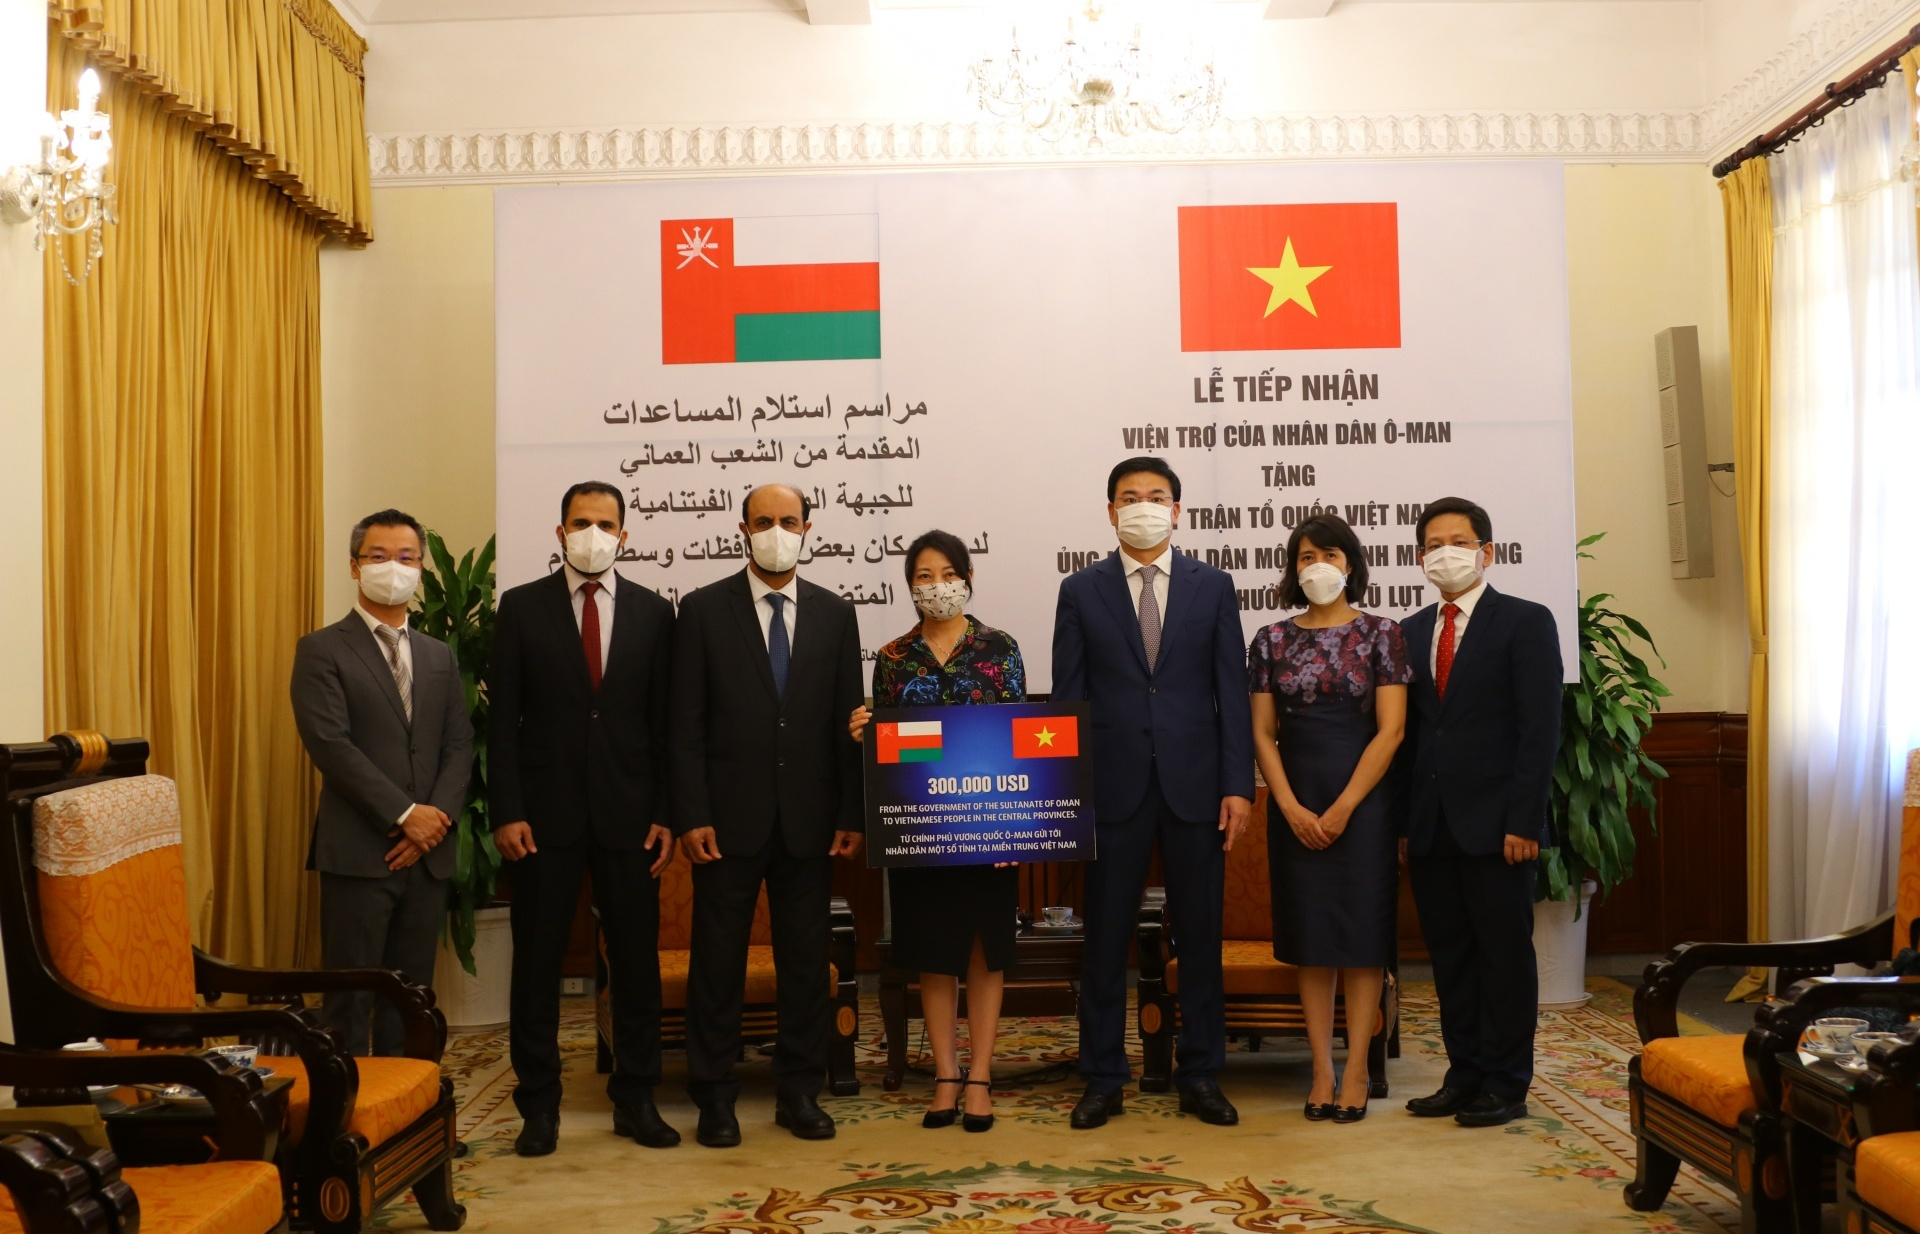 Bridging economic and bilateral cooperation between Vietnam and Oman